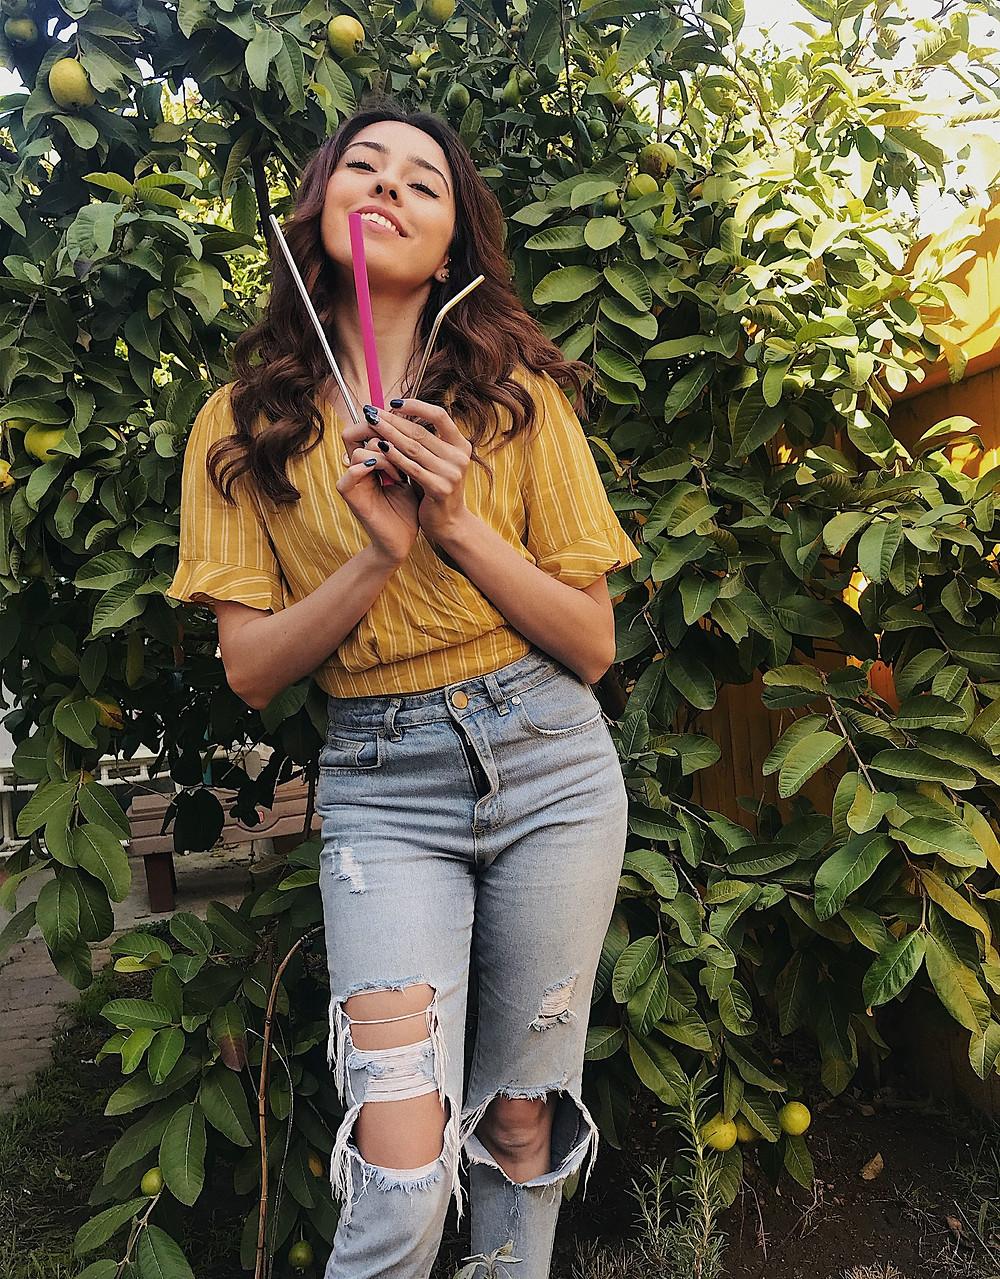 Girl smiling holding metal reusable silicone straws sustainable living zero waste lifestyle blog 90's fashion